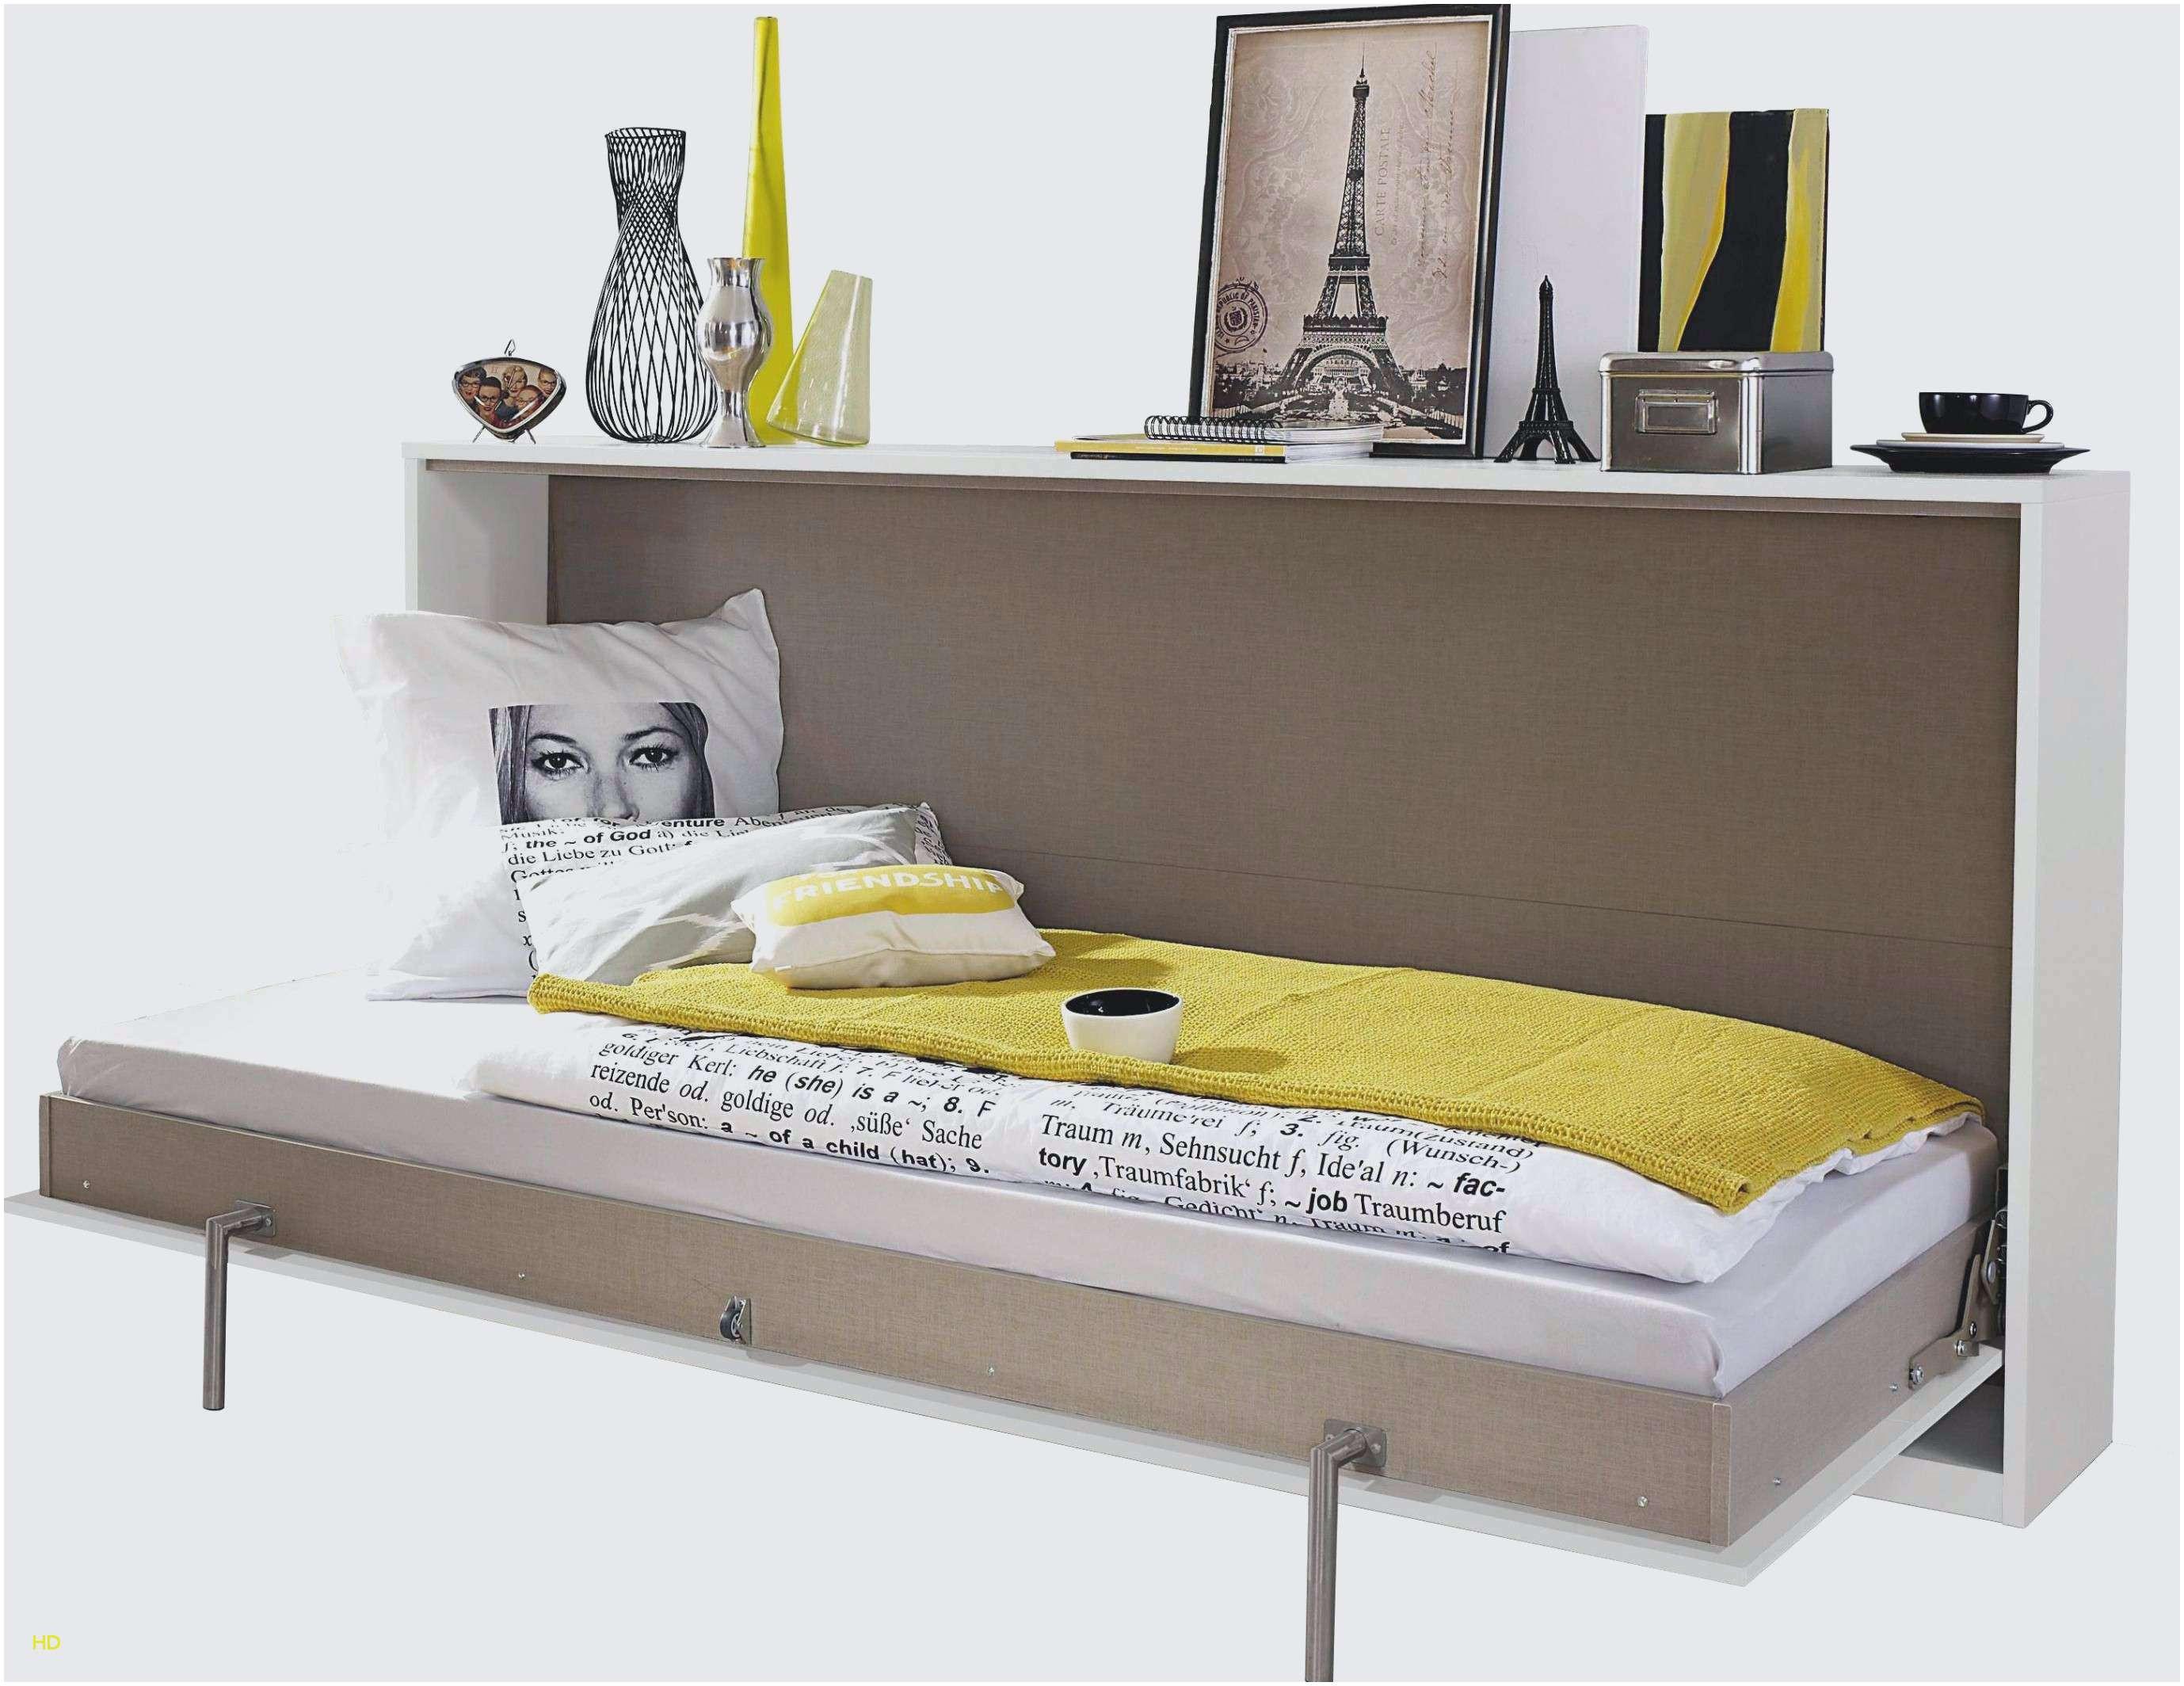 Ikea Slatted Bed Base Vs Box Spring Frais Hochbett 90×200 Weia Ungewohnlich Ideen Pour Option Lit Flaxa